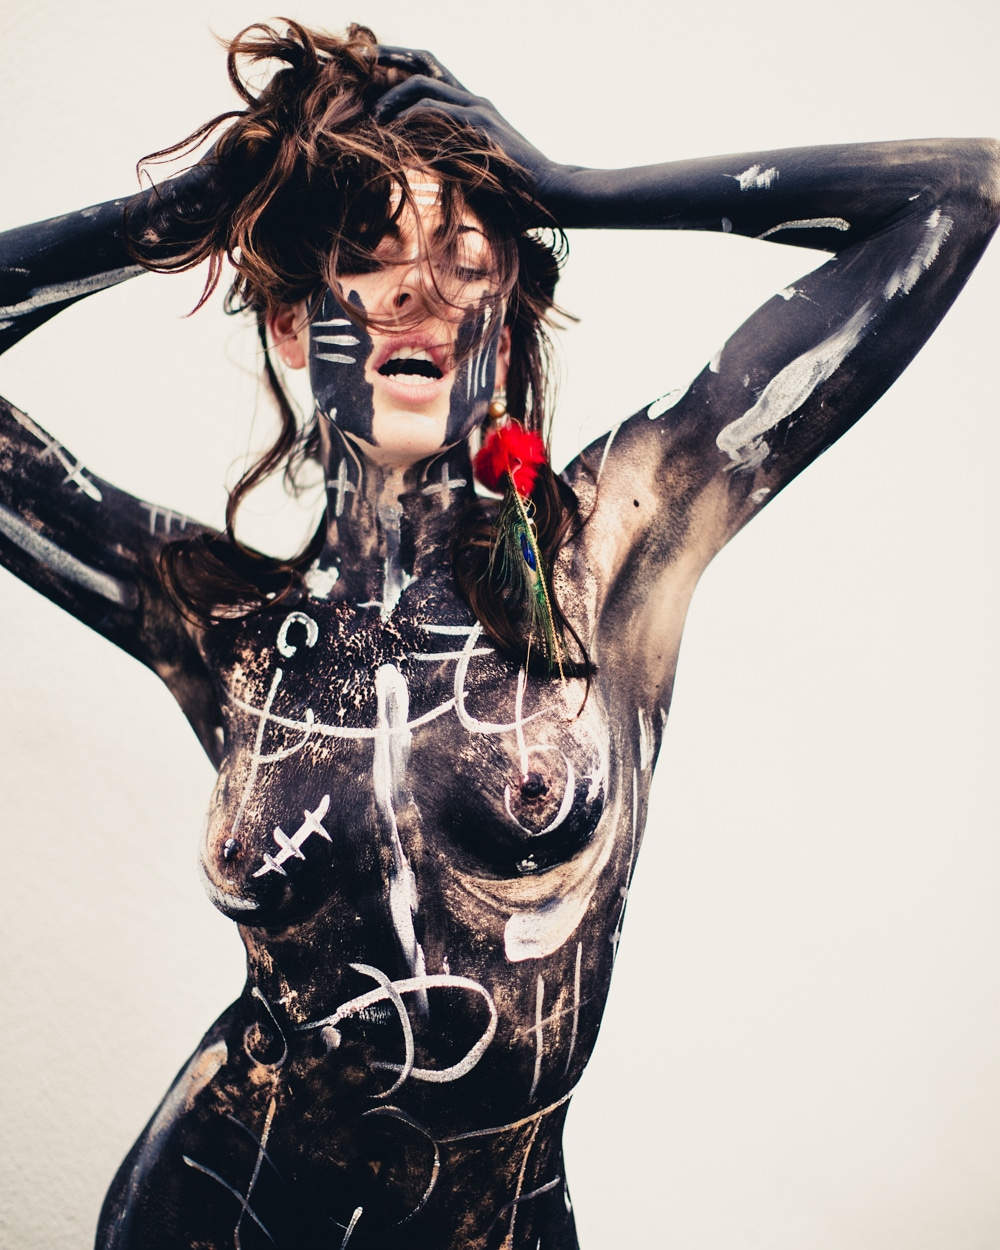 primal_fashion_by_gregory_beylerian-16